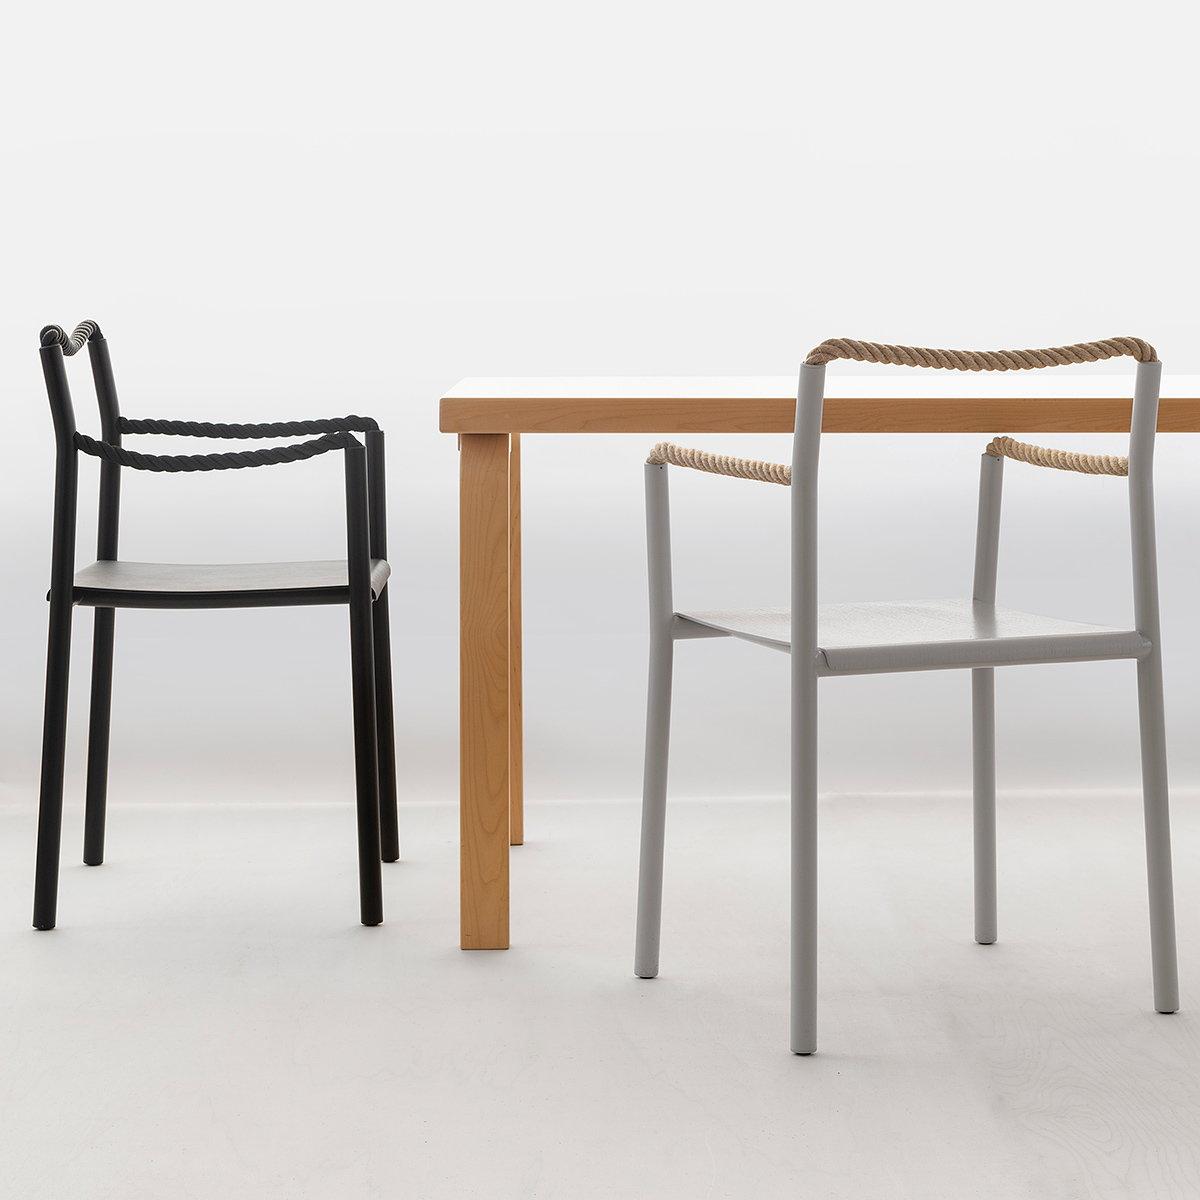 Ronan & Erwan Bouroullec artek rope chair by ronan & erwan bouroullec